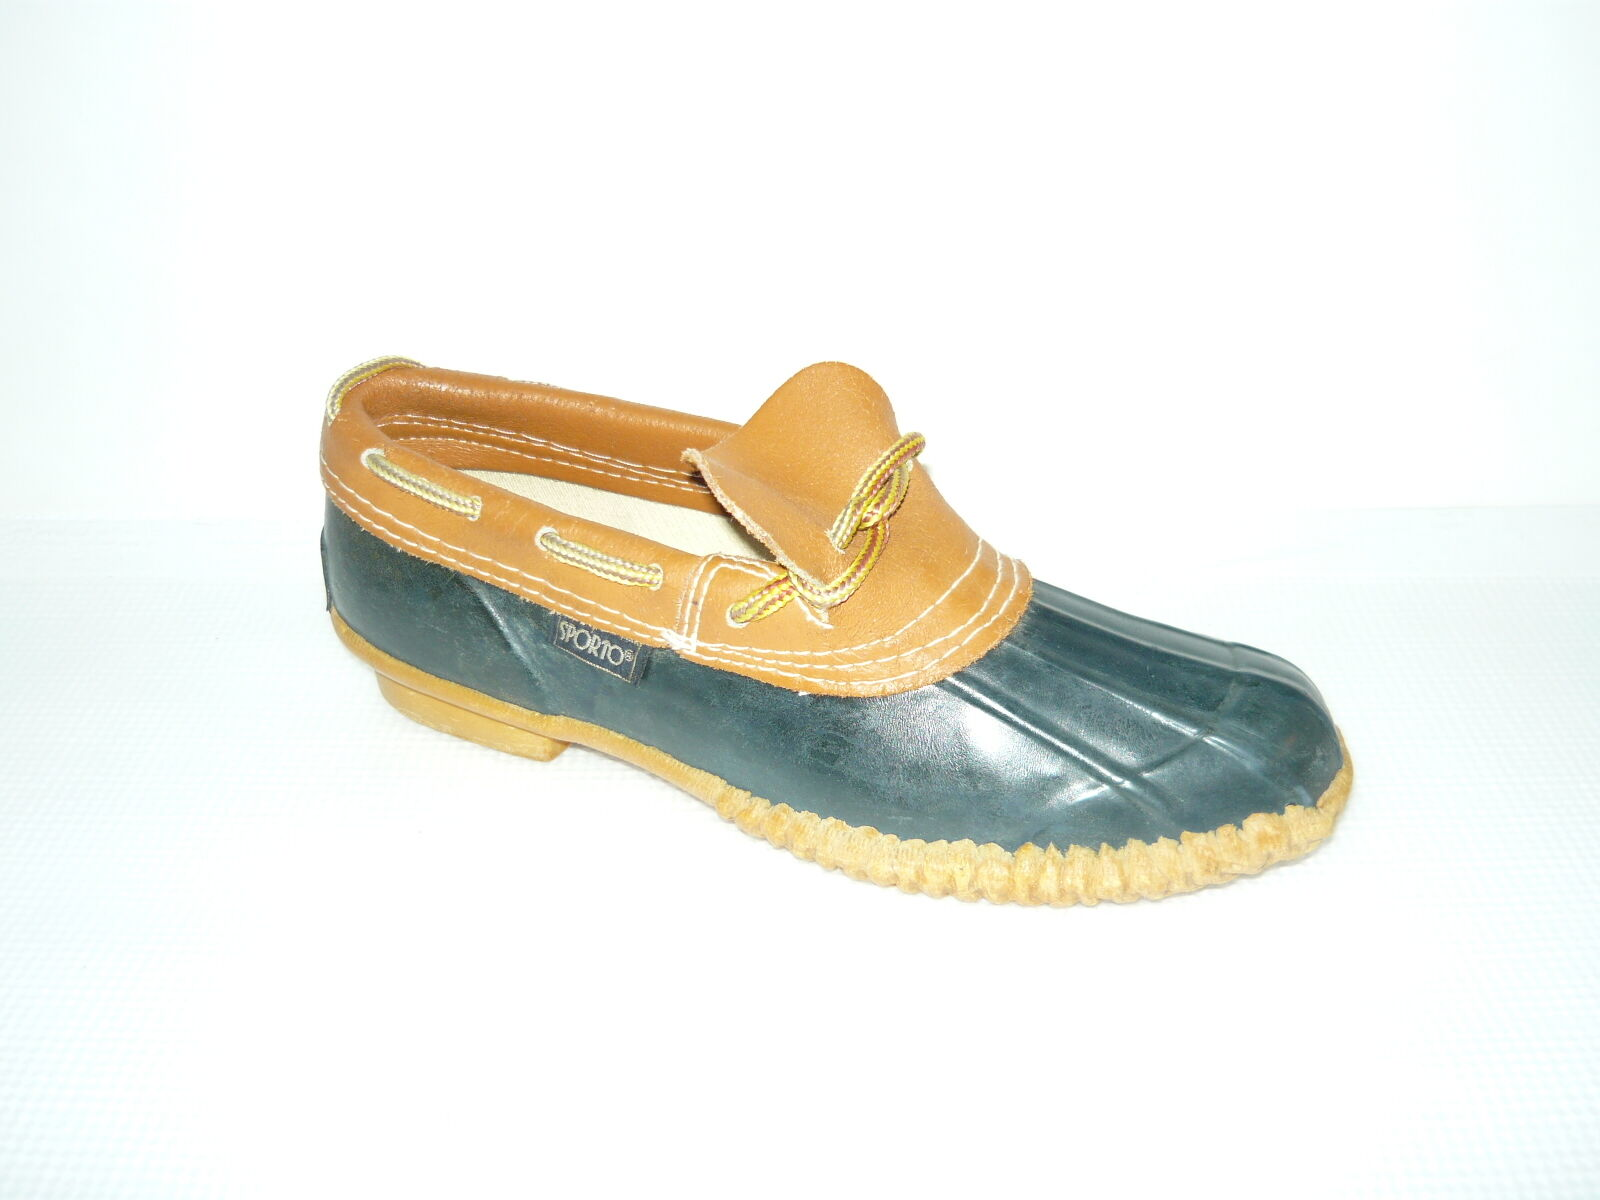 VTG Sporto Original Rain Snow Duck bottes bleu marron Leather Rubber femmes Taille 7